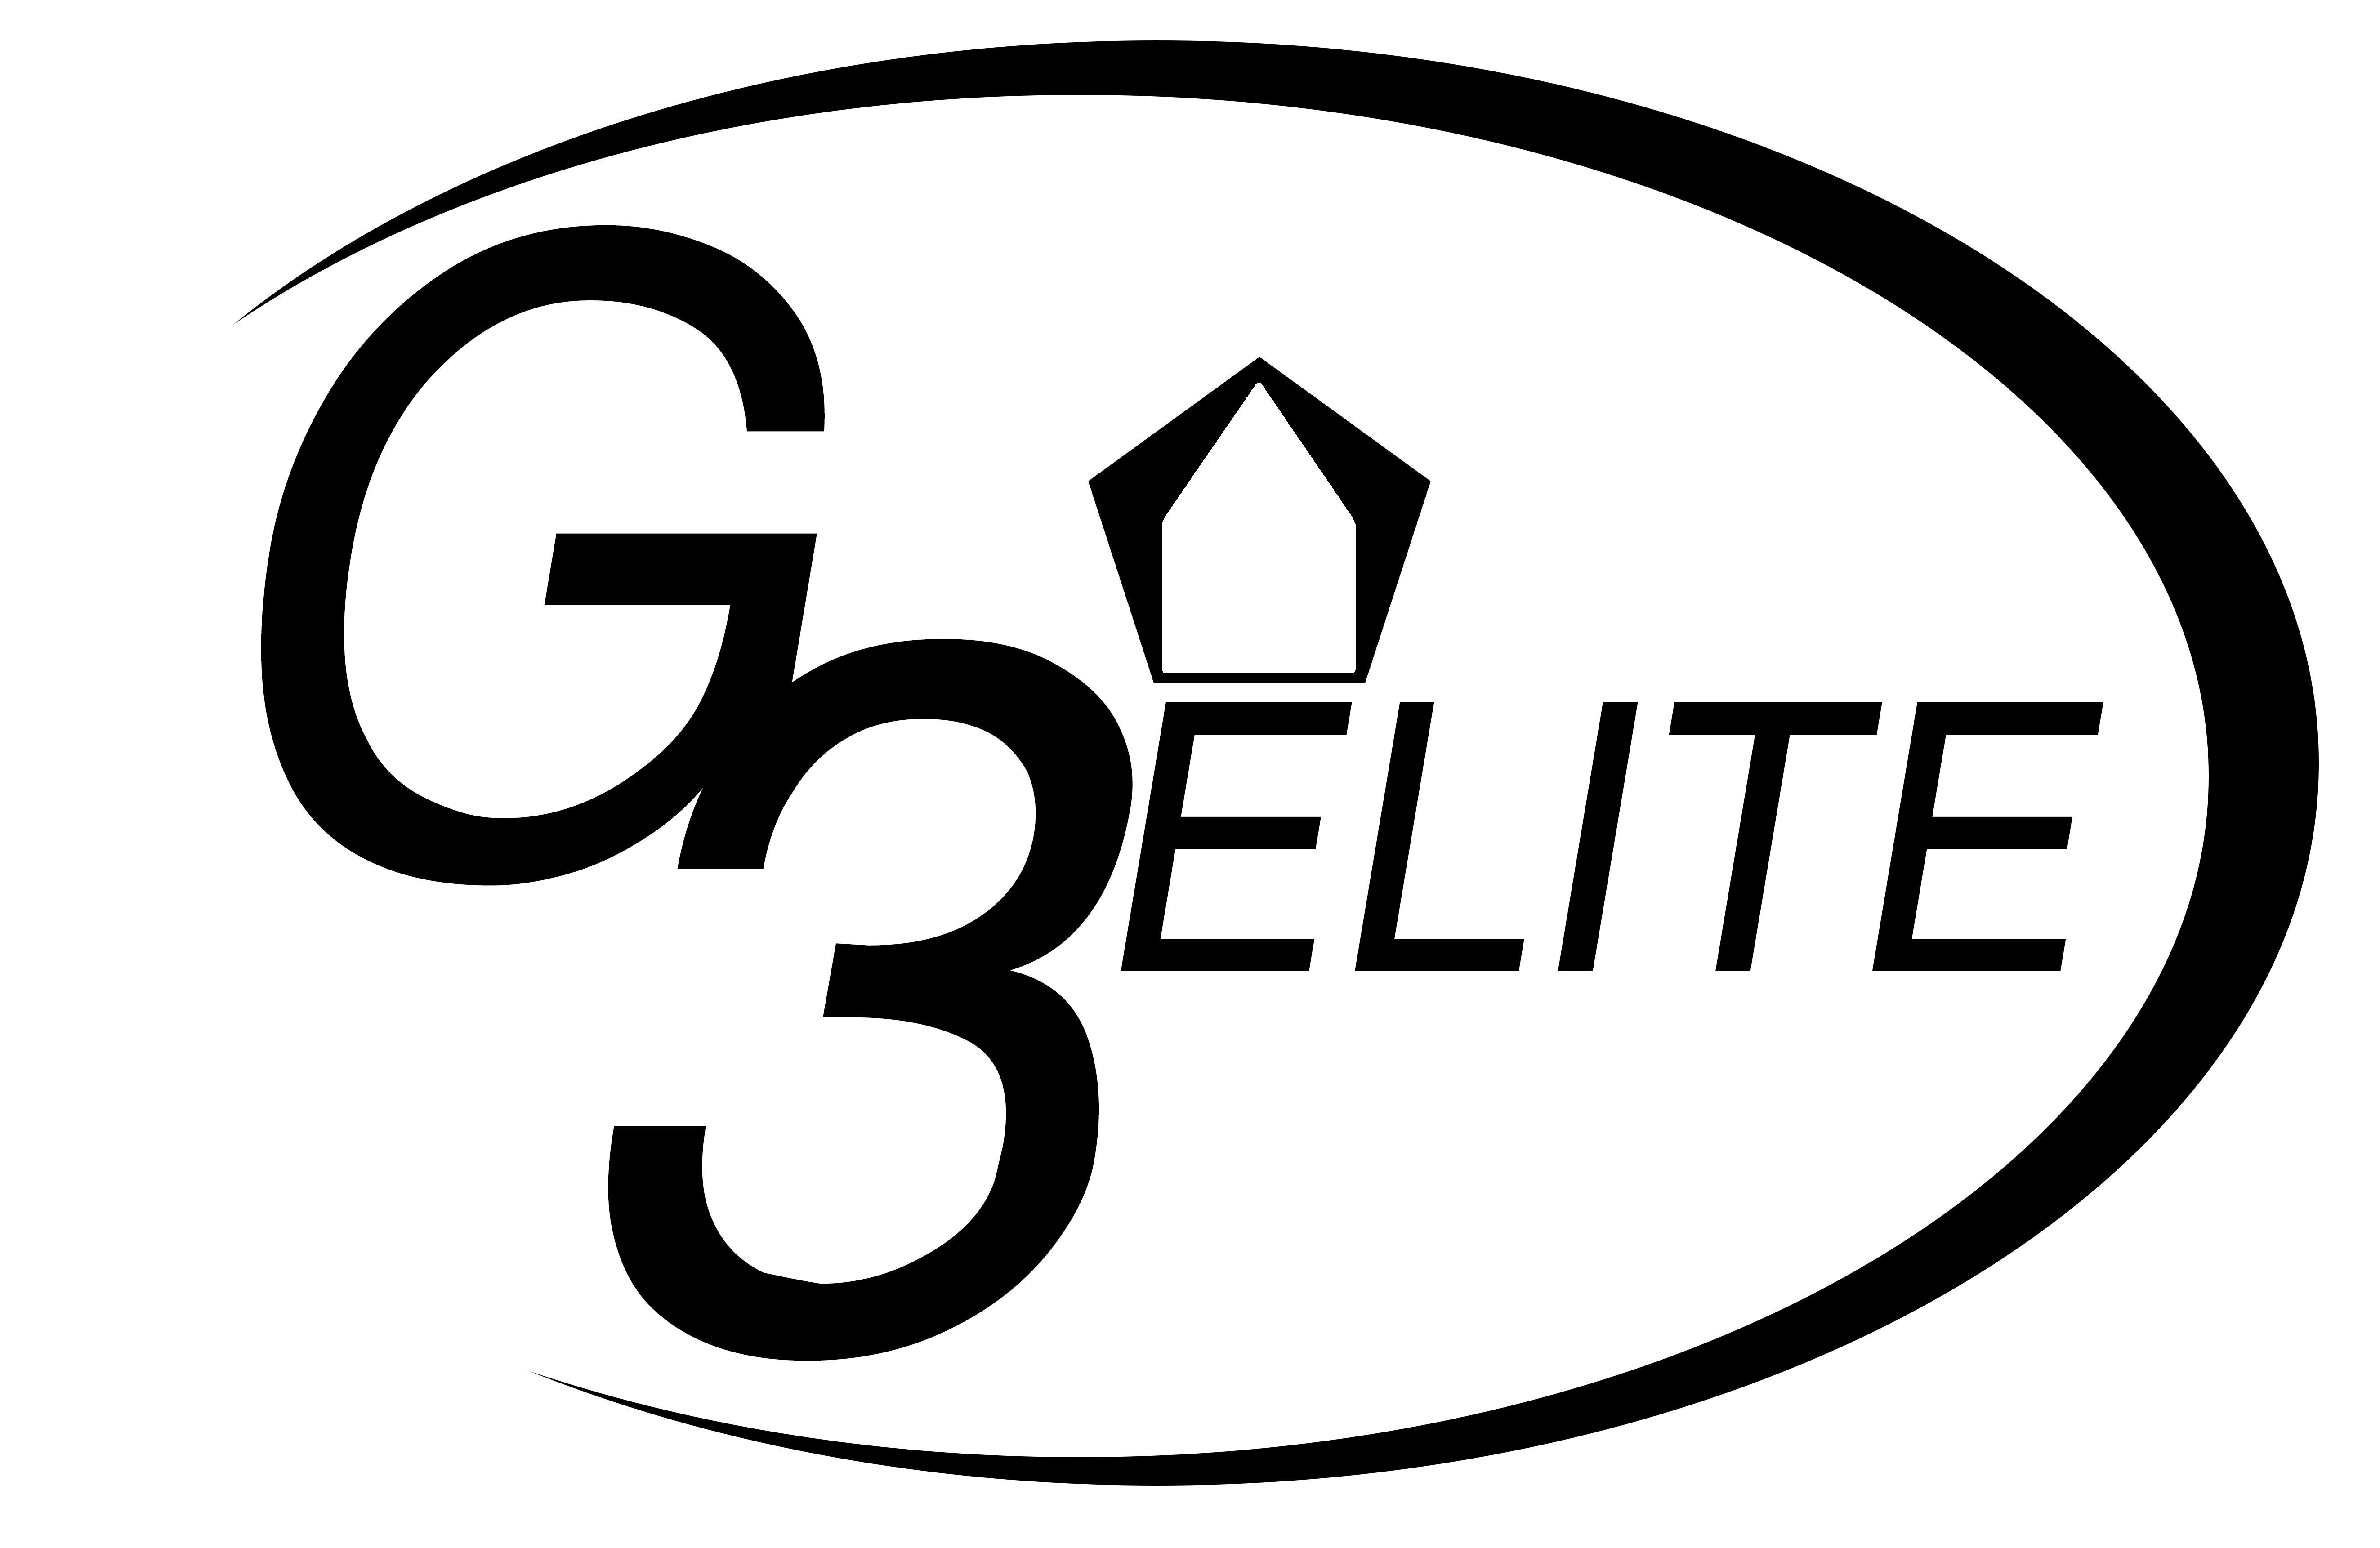 039c50a76e41 G3Elite